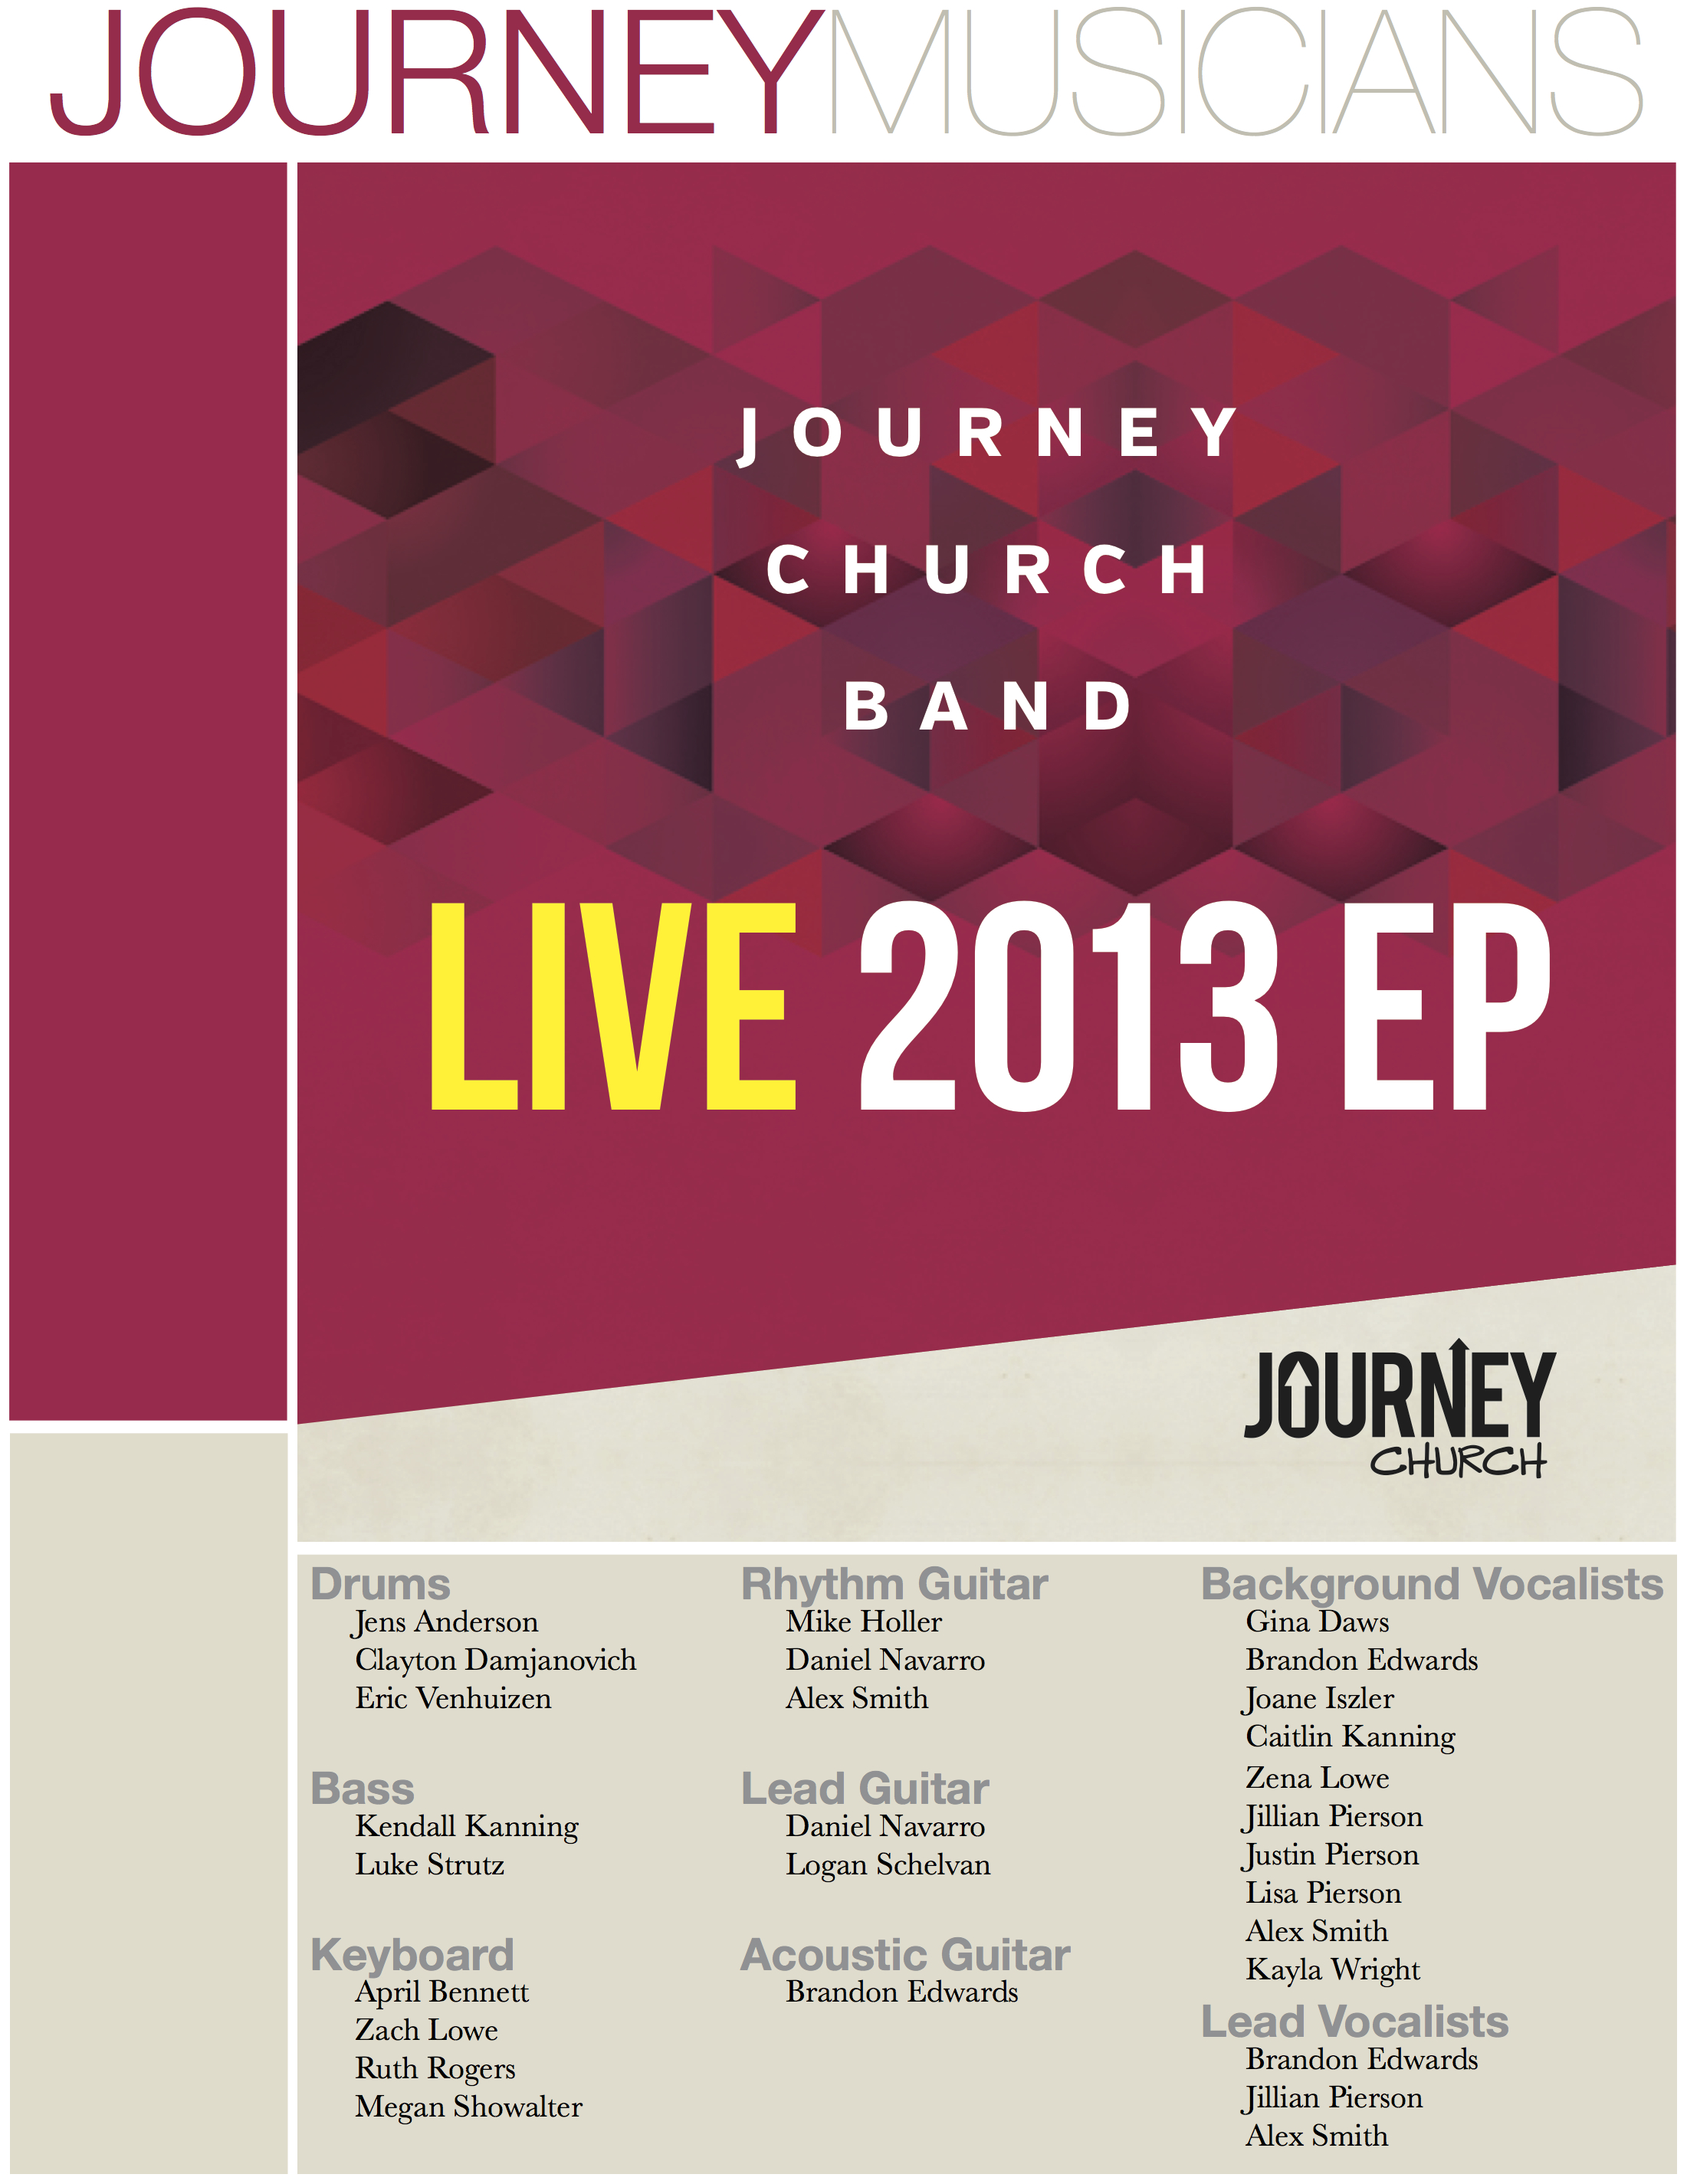 Journey Musicians on Live 2013 EP JPEG.jpg